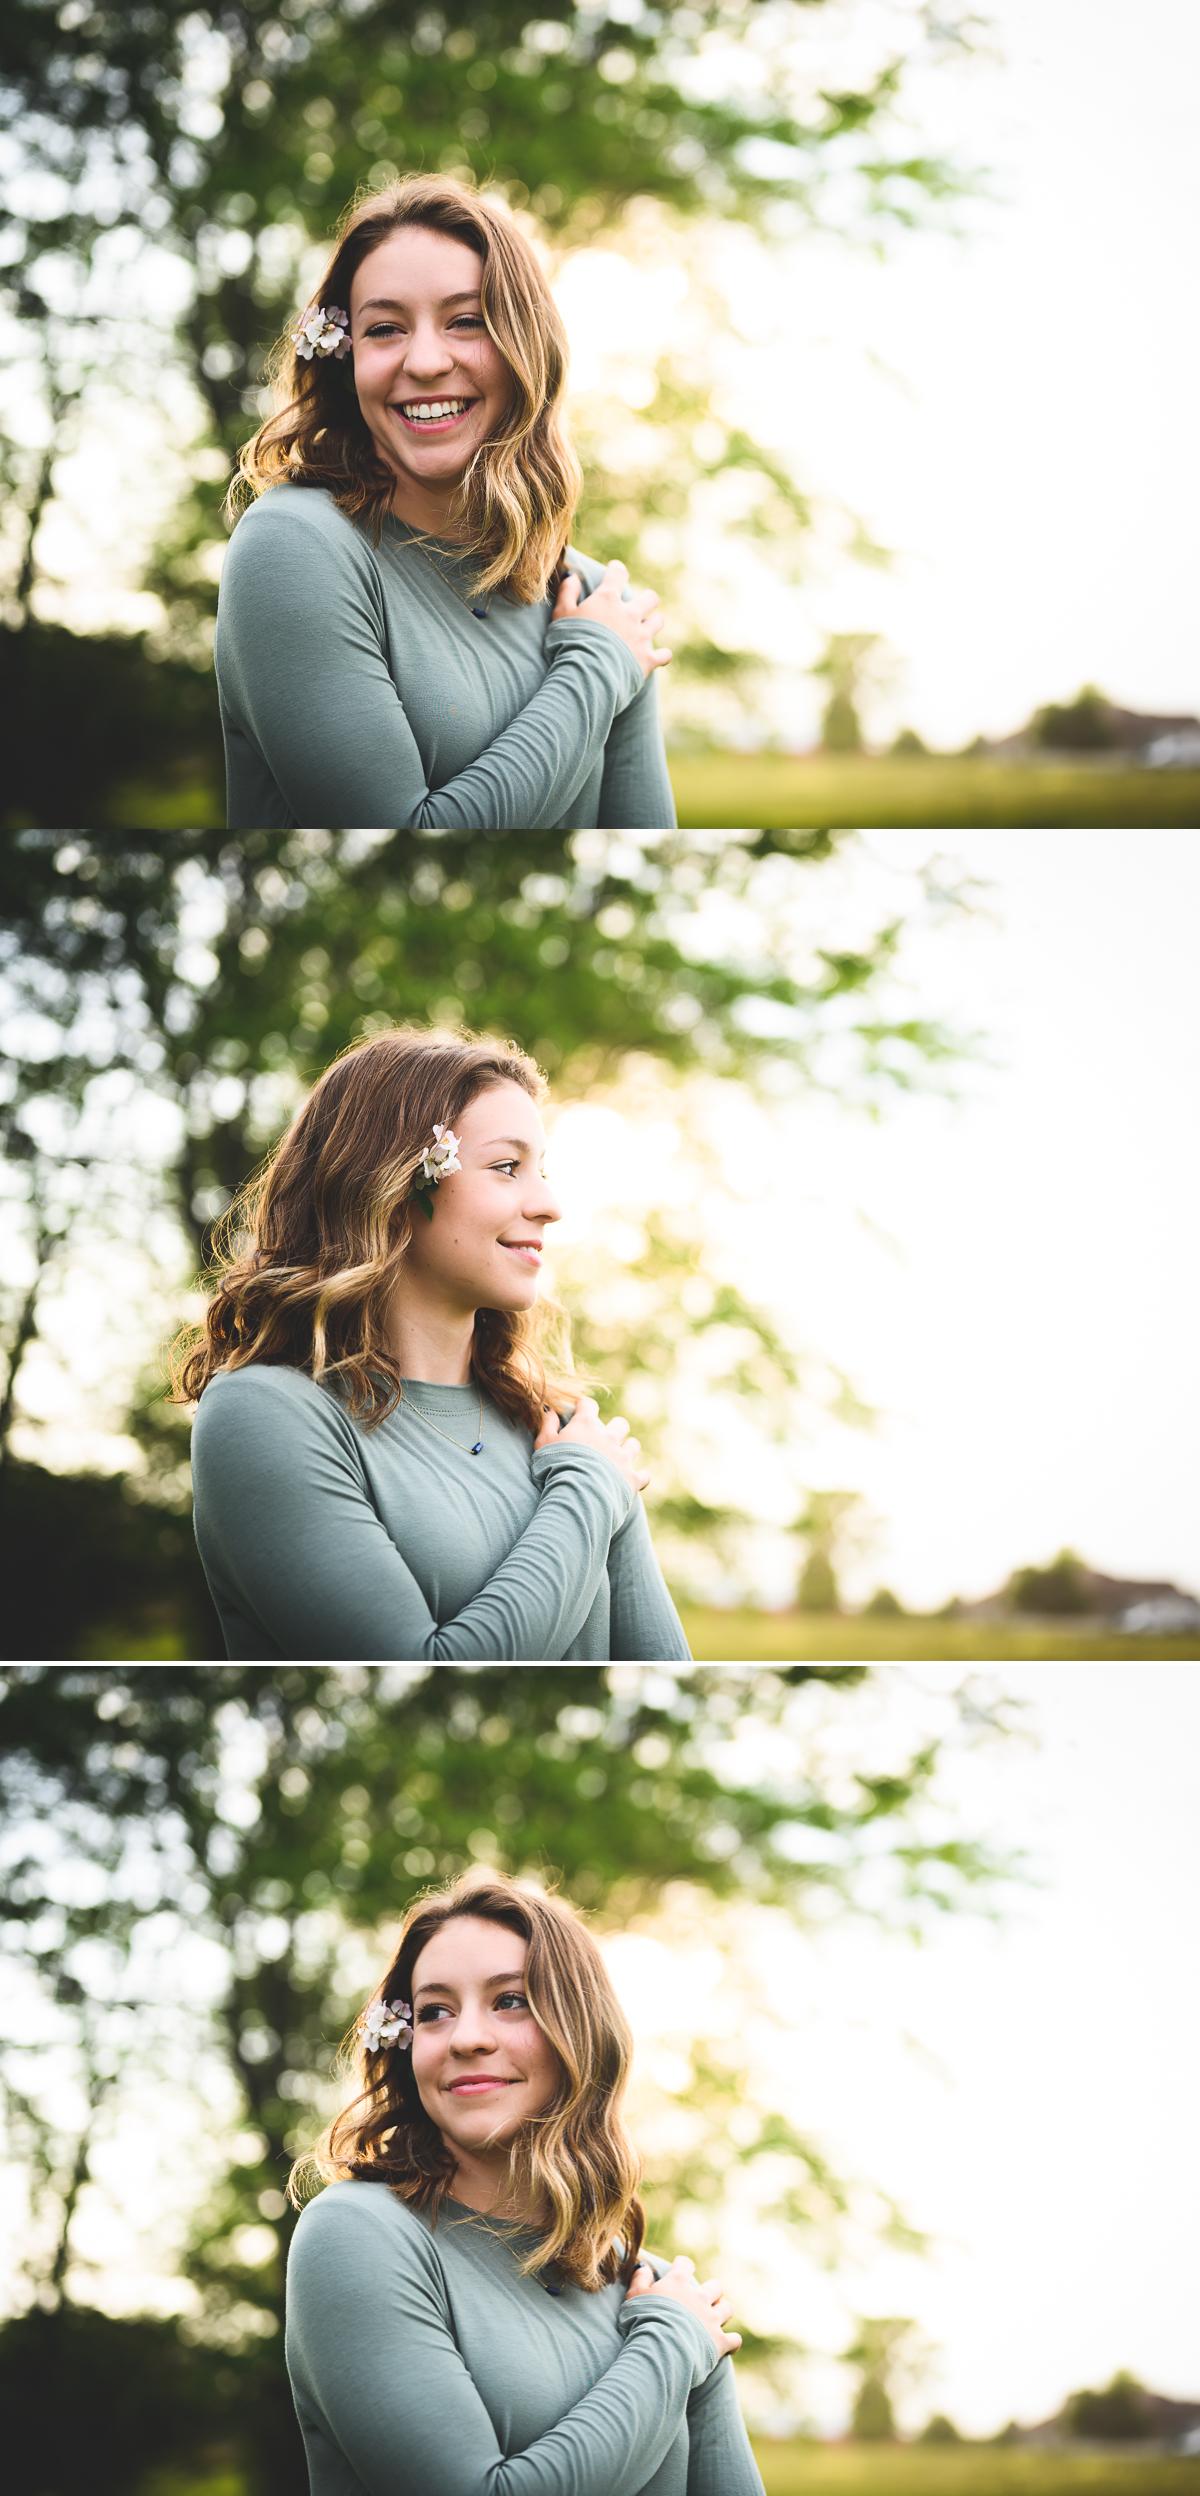 brooke-and-cheryl-bloomington-normal-senior-photographers.jpg